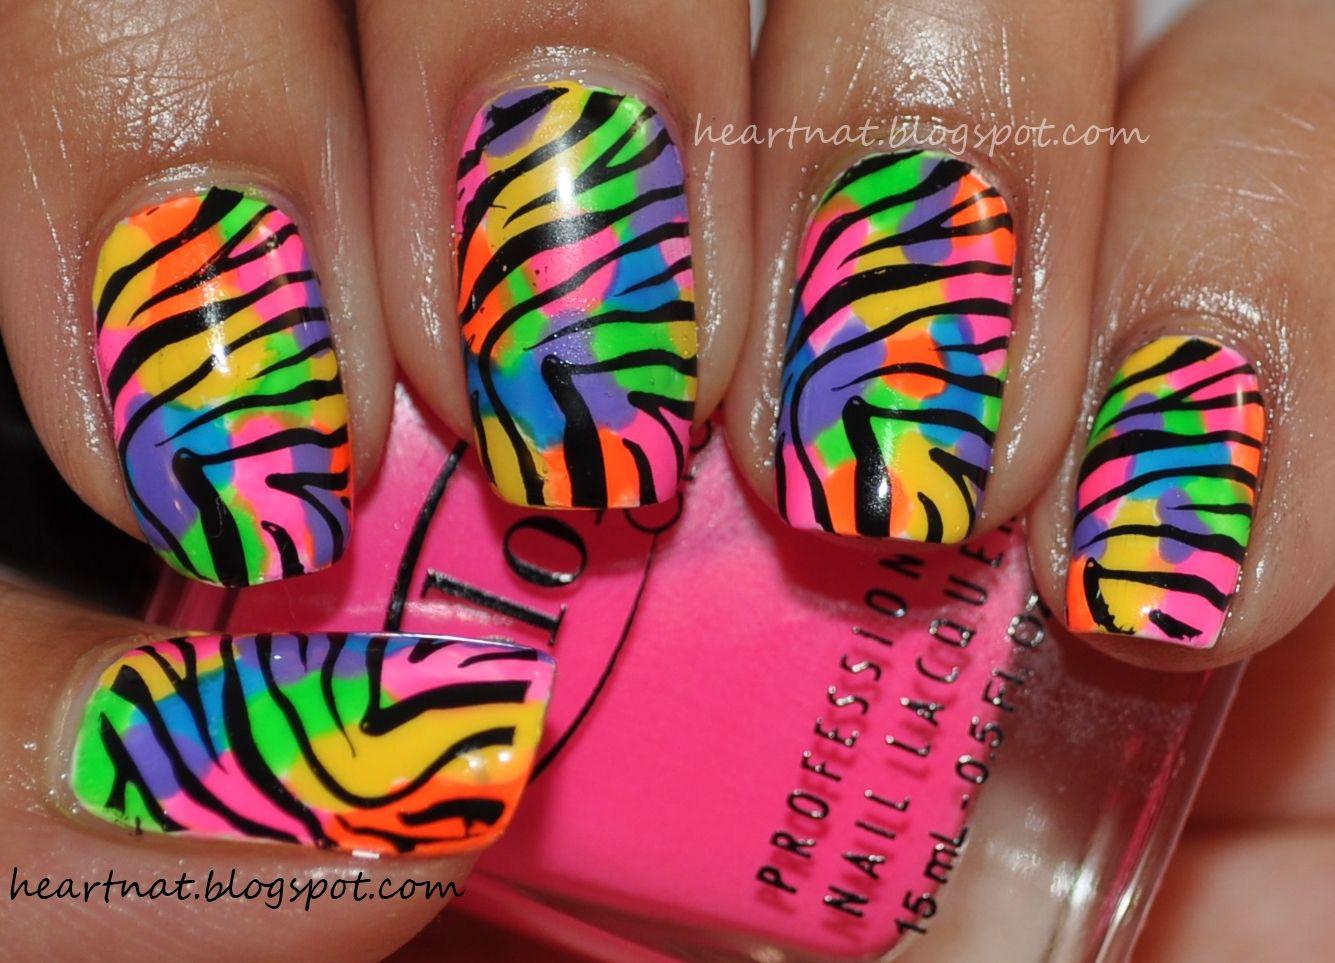 heartnat: Nicki Minaj Inspired Nails #4   Nail designs   Pinterest ...